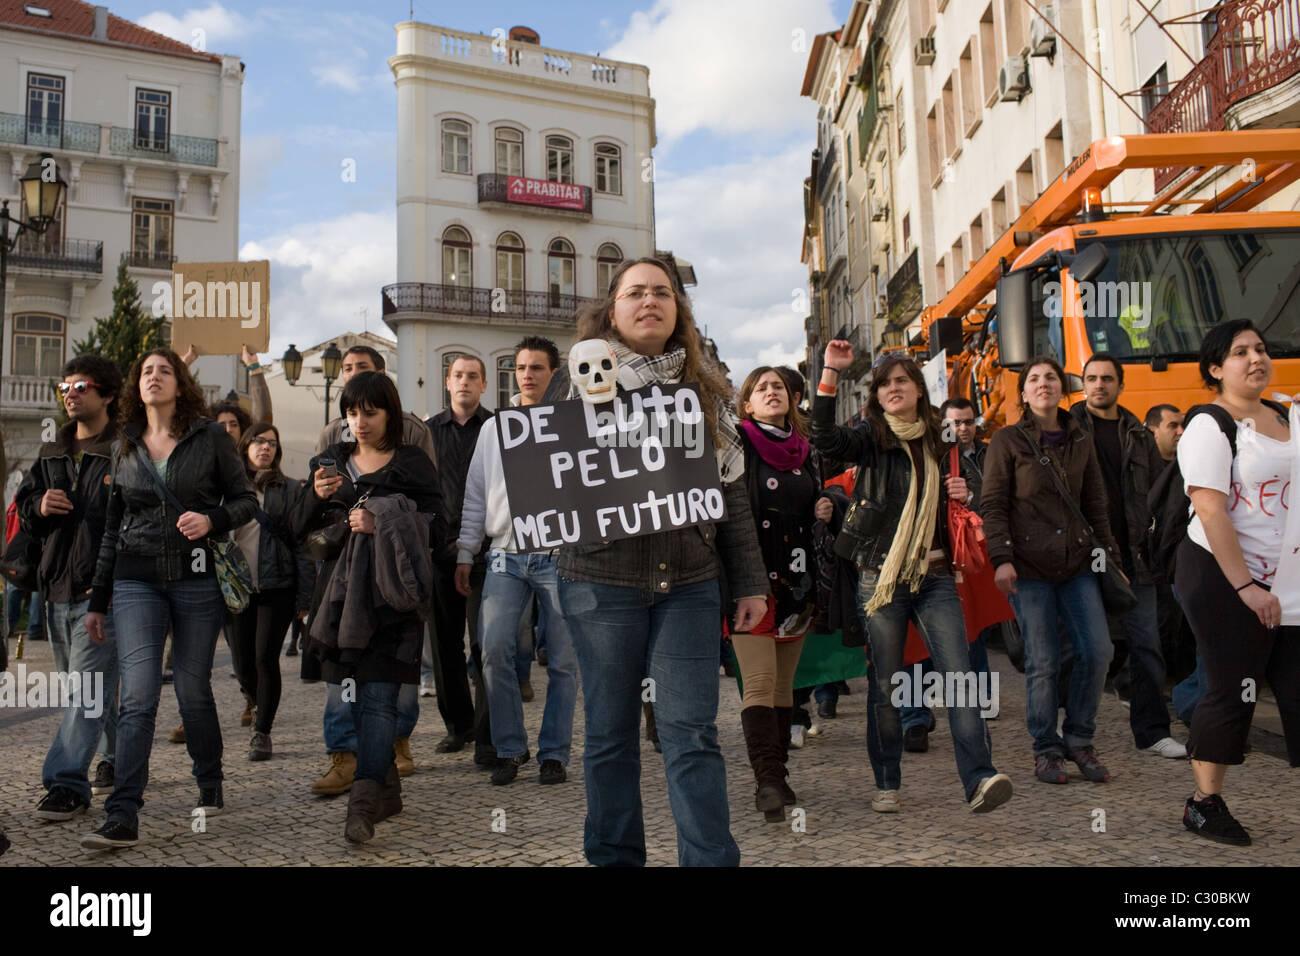 Anti-banco, pro-empleo protesta en Coimbra, Portugal Imagen De Stock